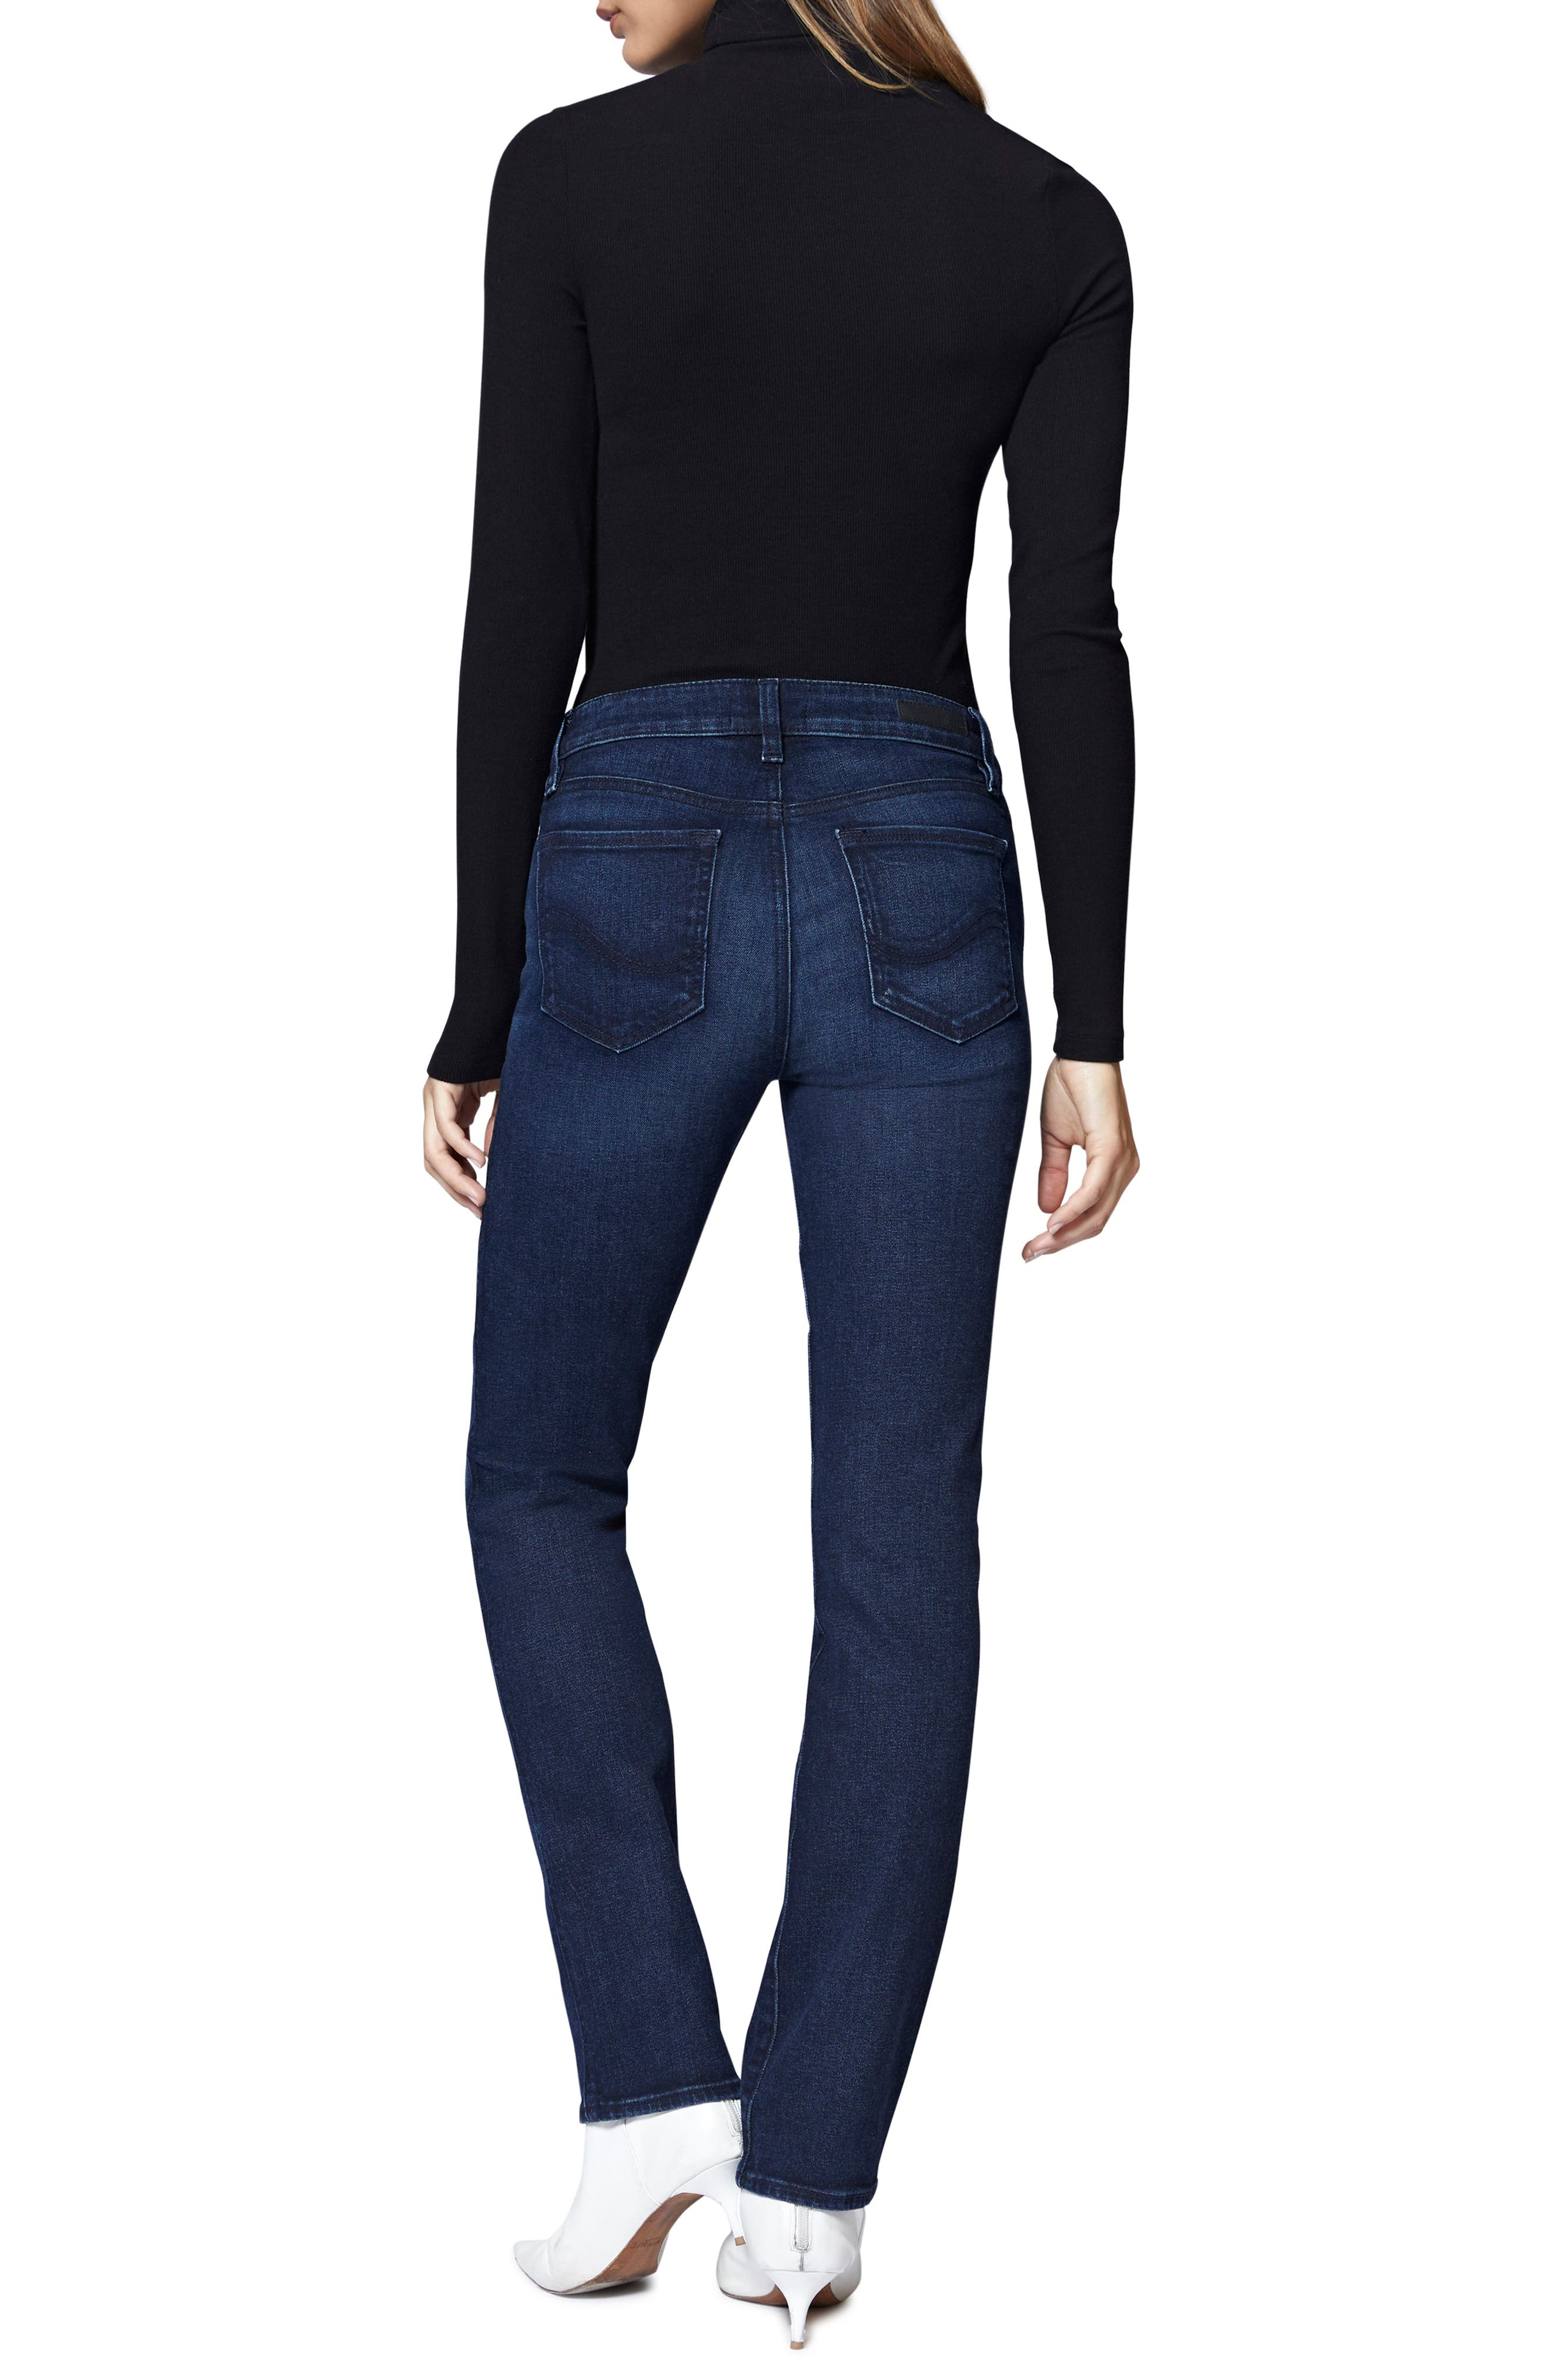 SANCTUARY,                             Social High Rise Raw Hem Skinny Ankle Jeans,                             Alternate thumbnail 5, color,                             401